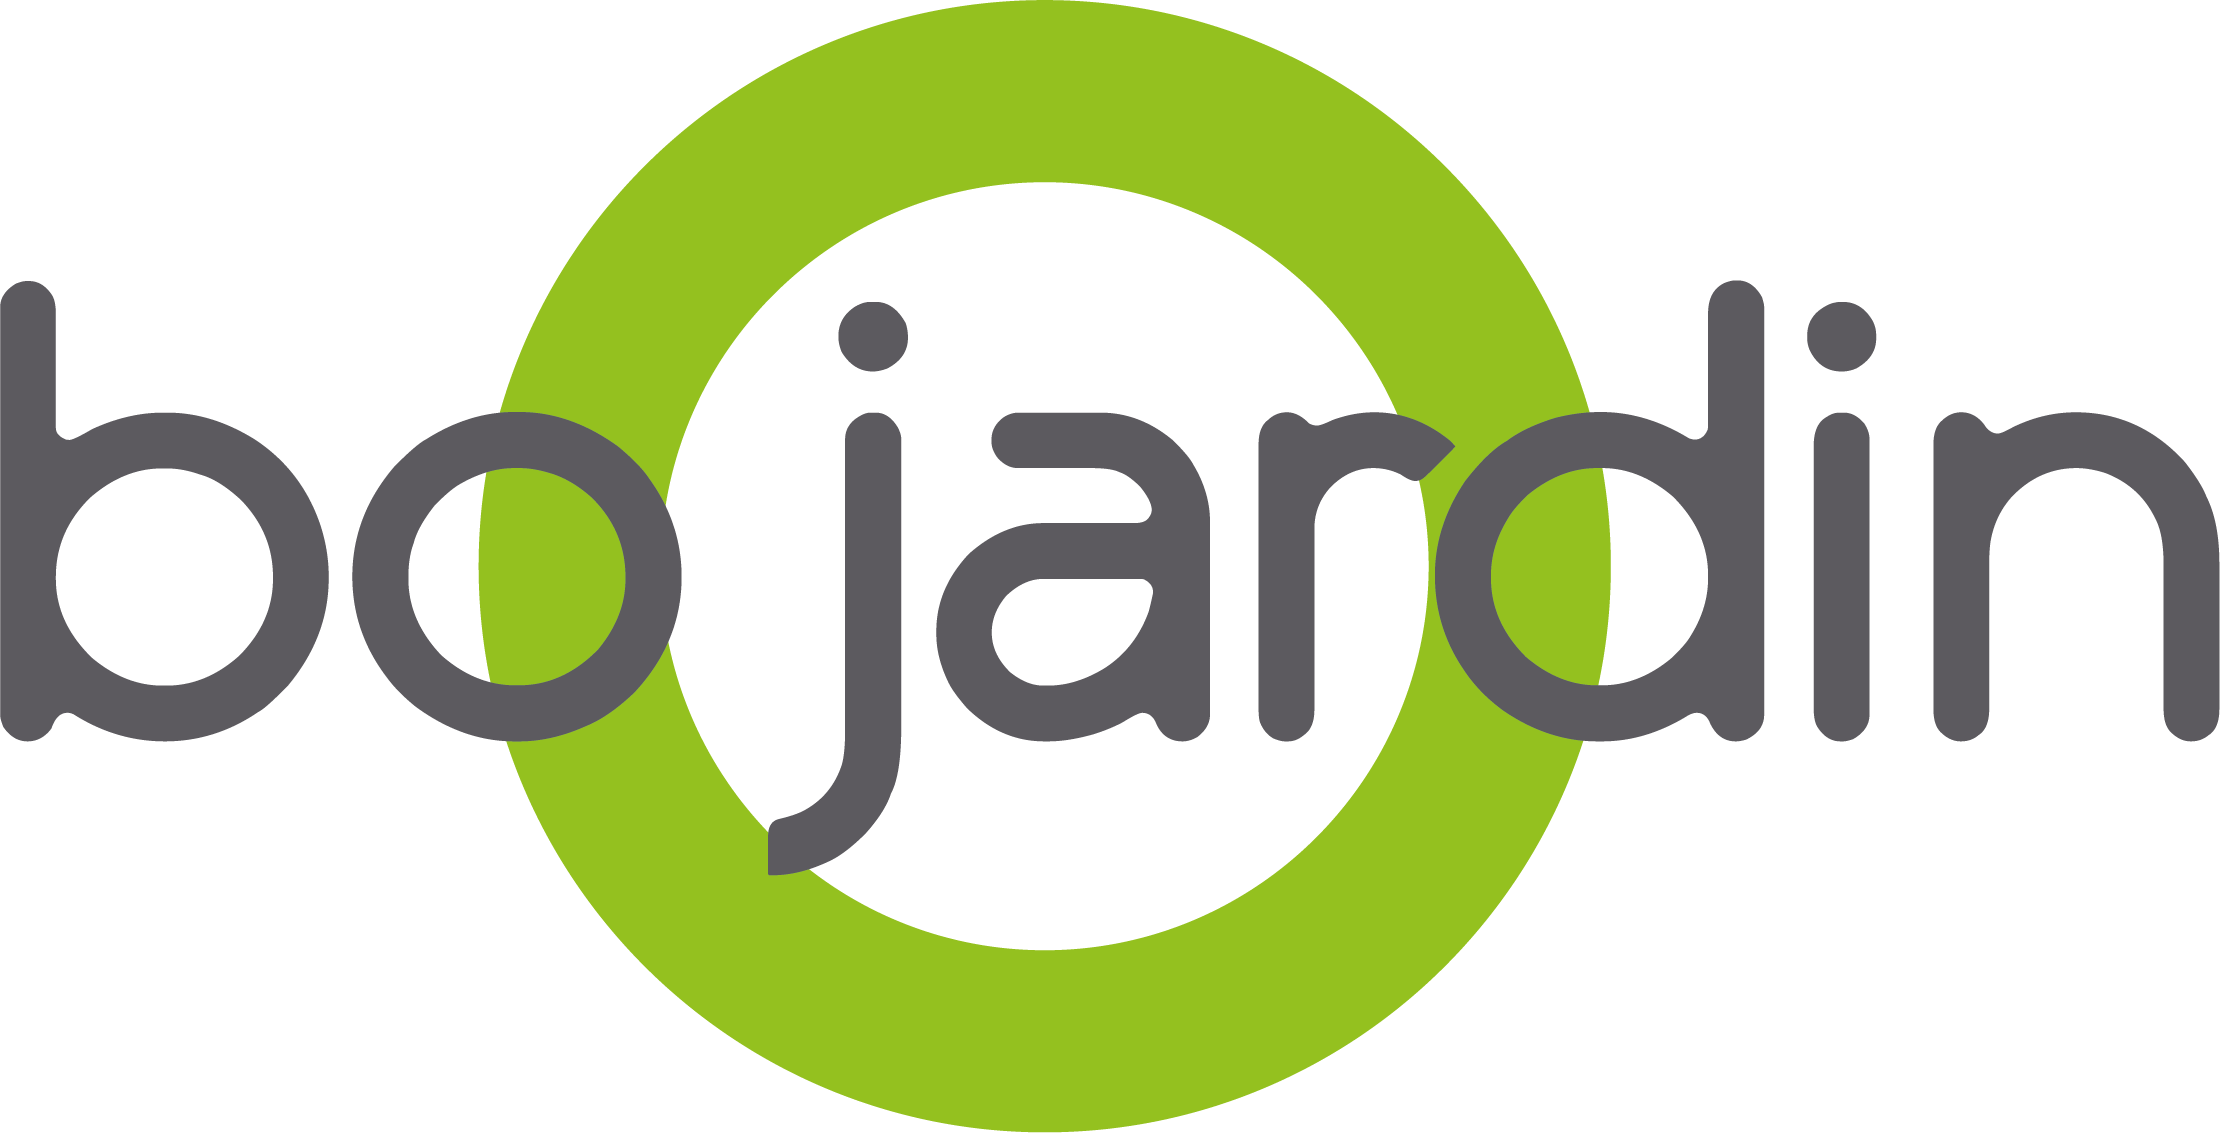 logo Obojardin